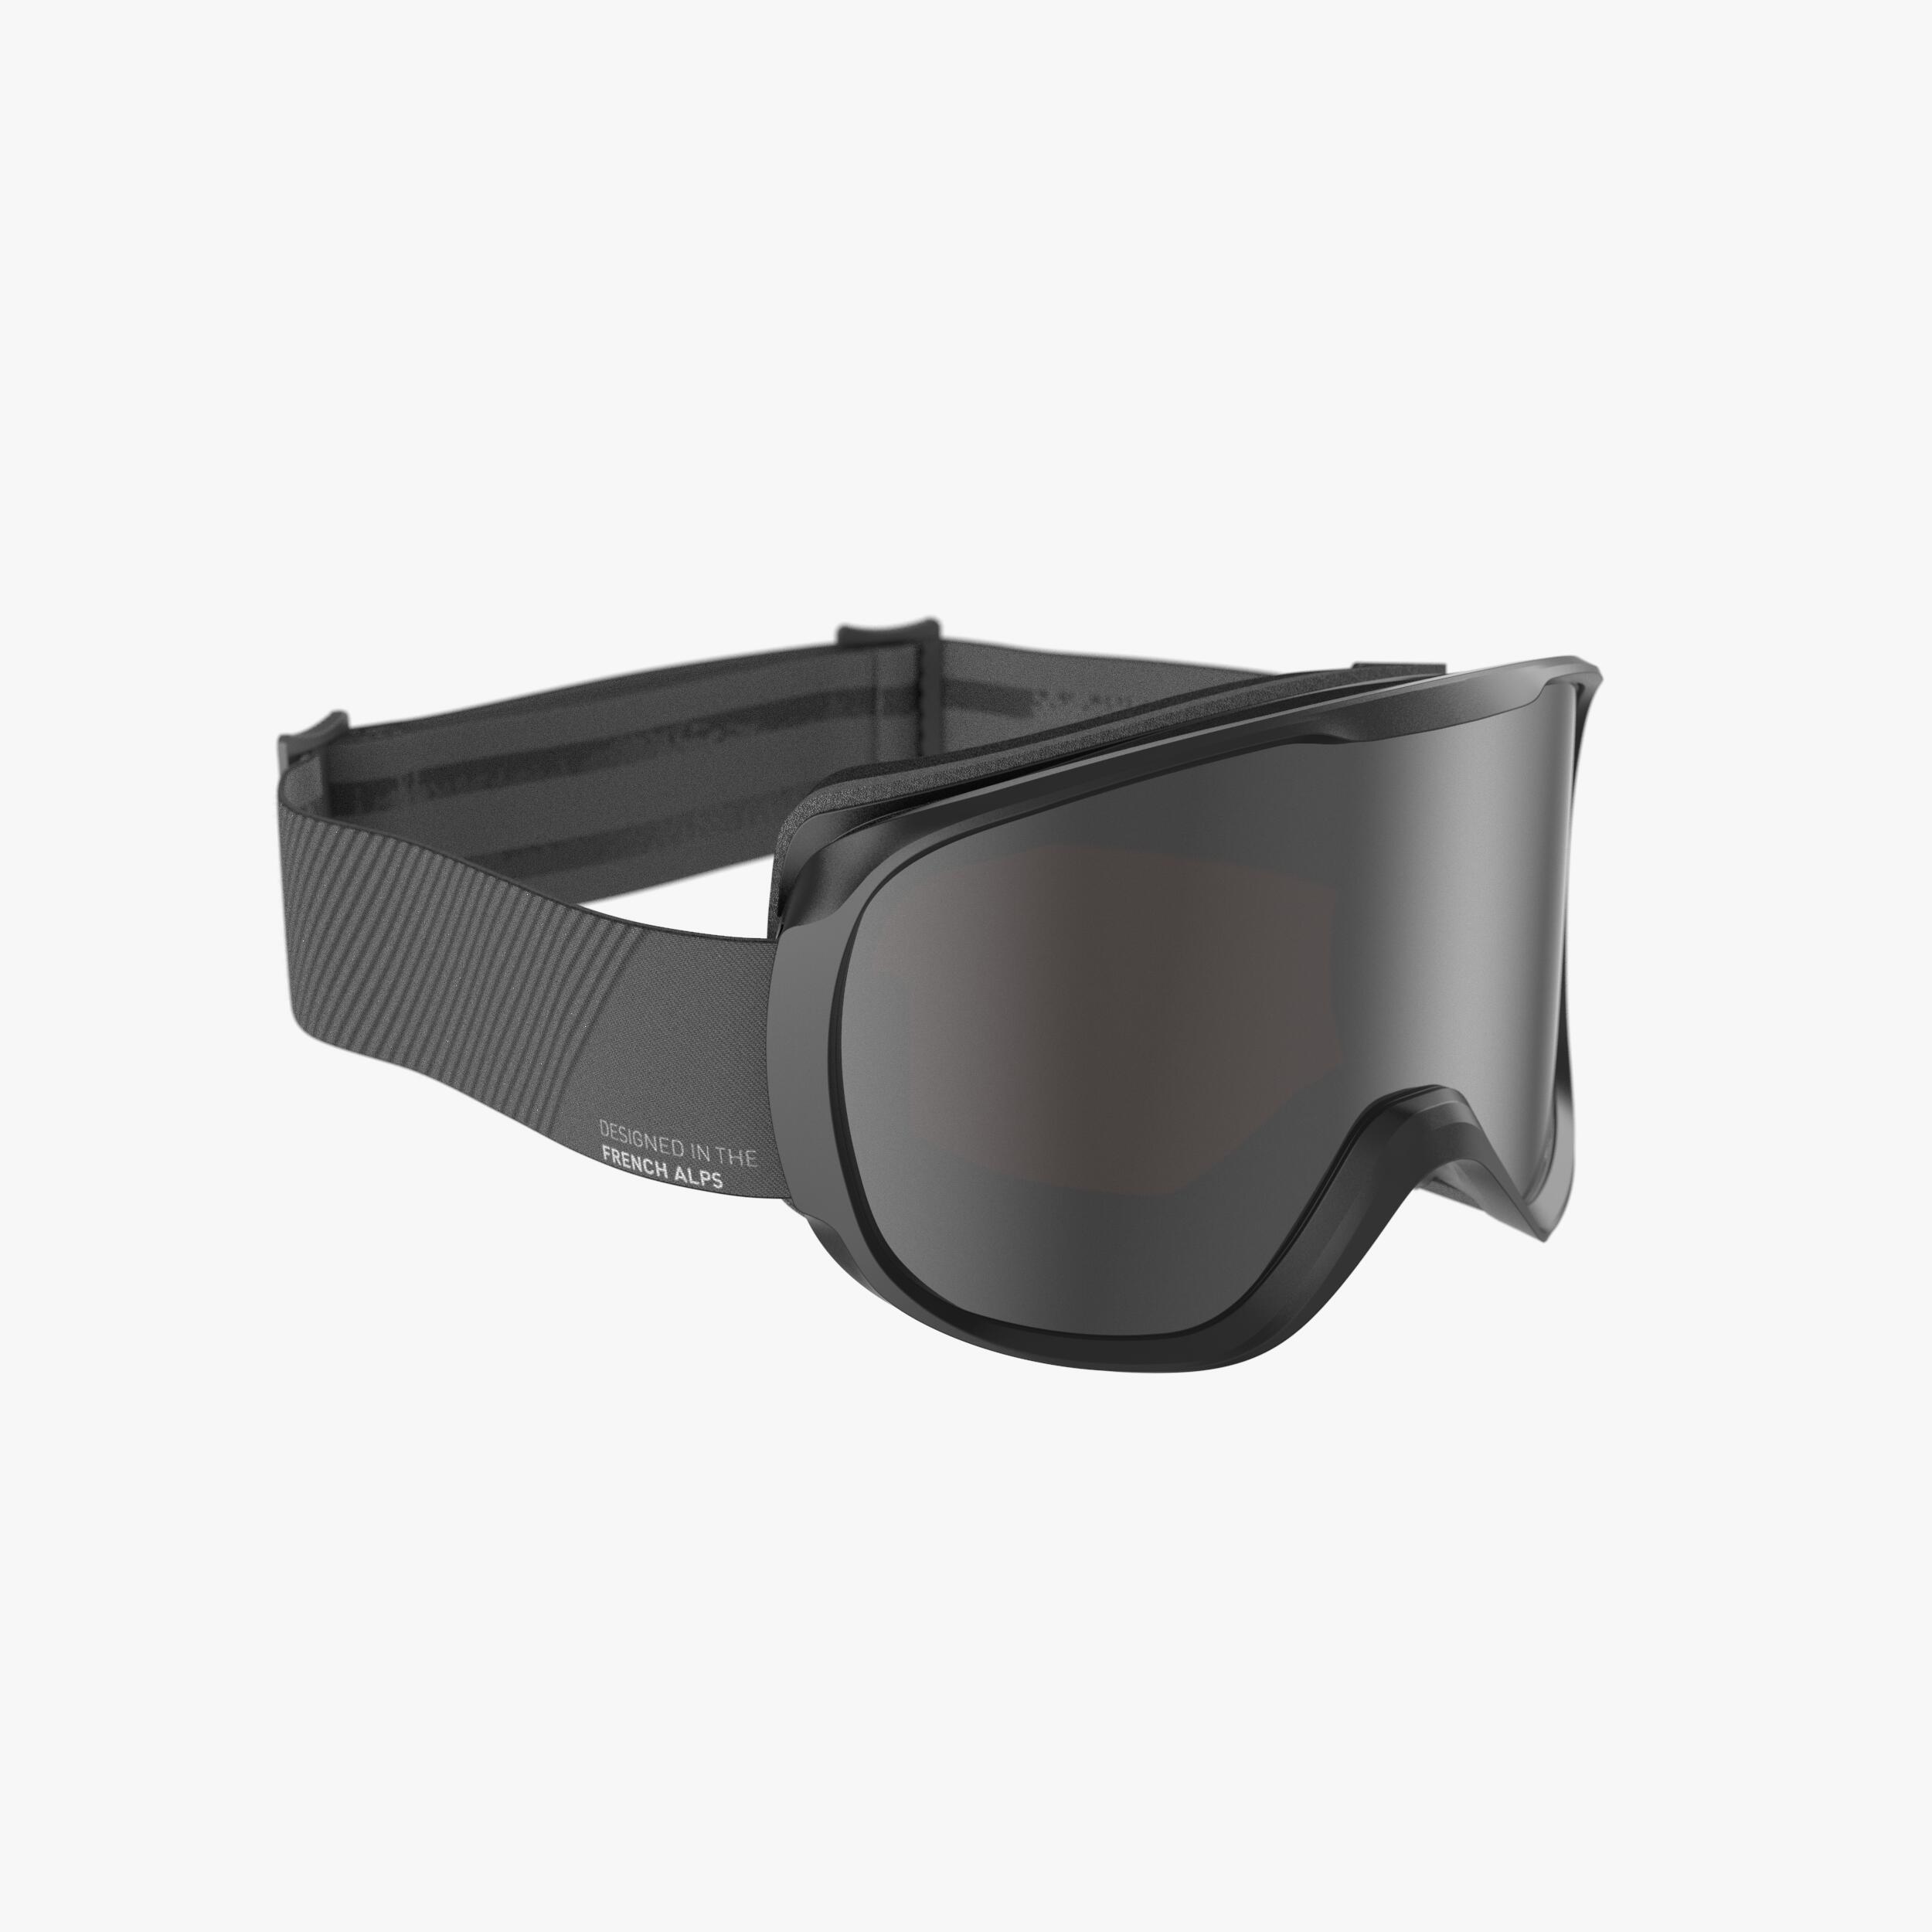 Ochelari schi G 500 S3 imagine produs